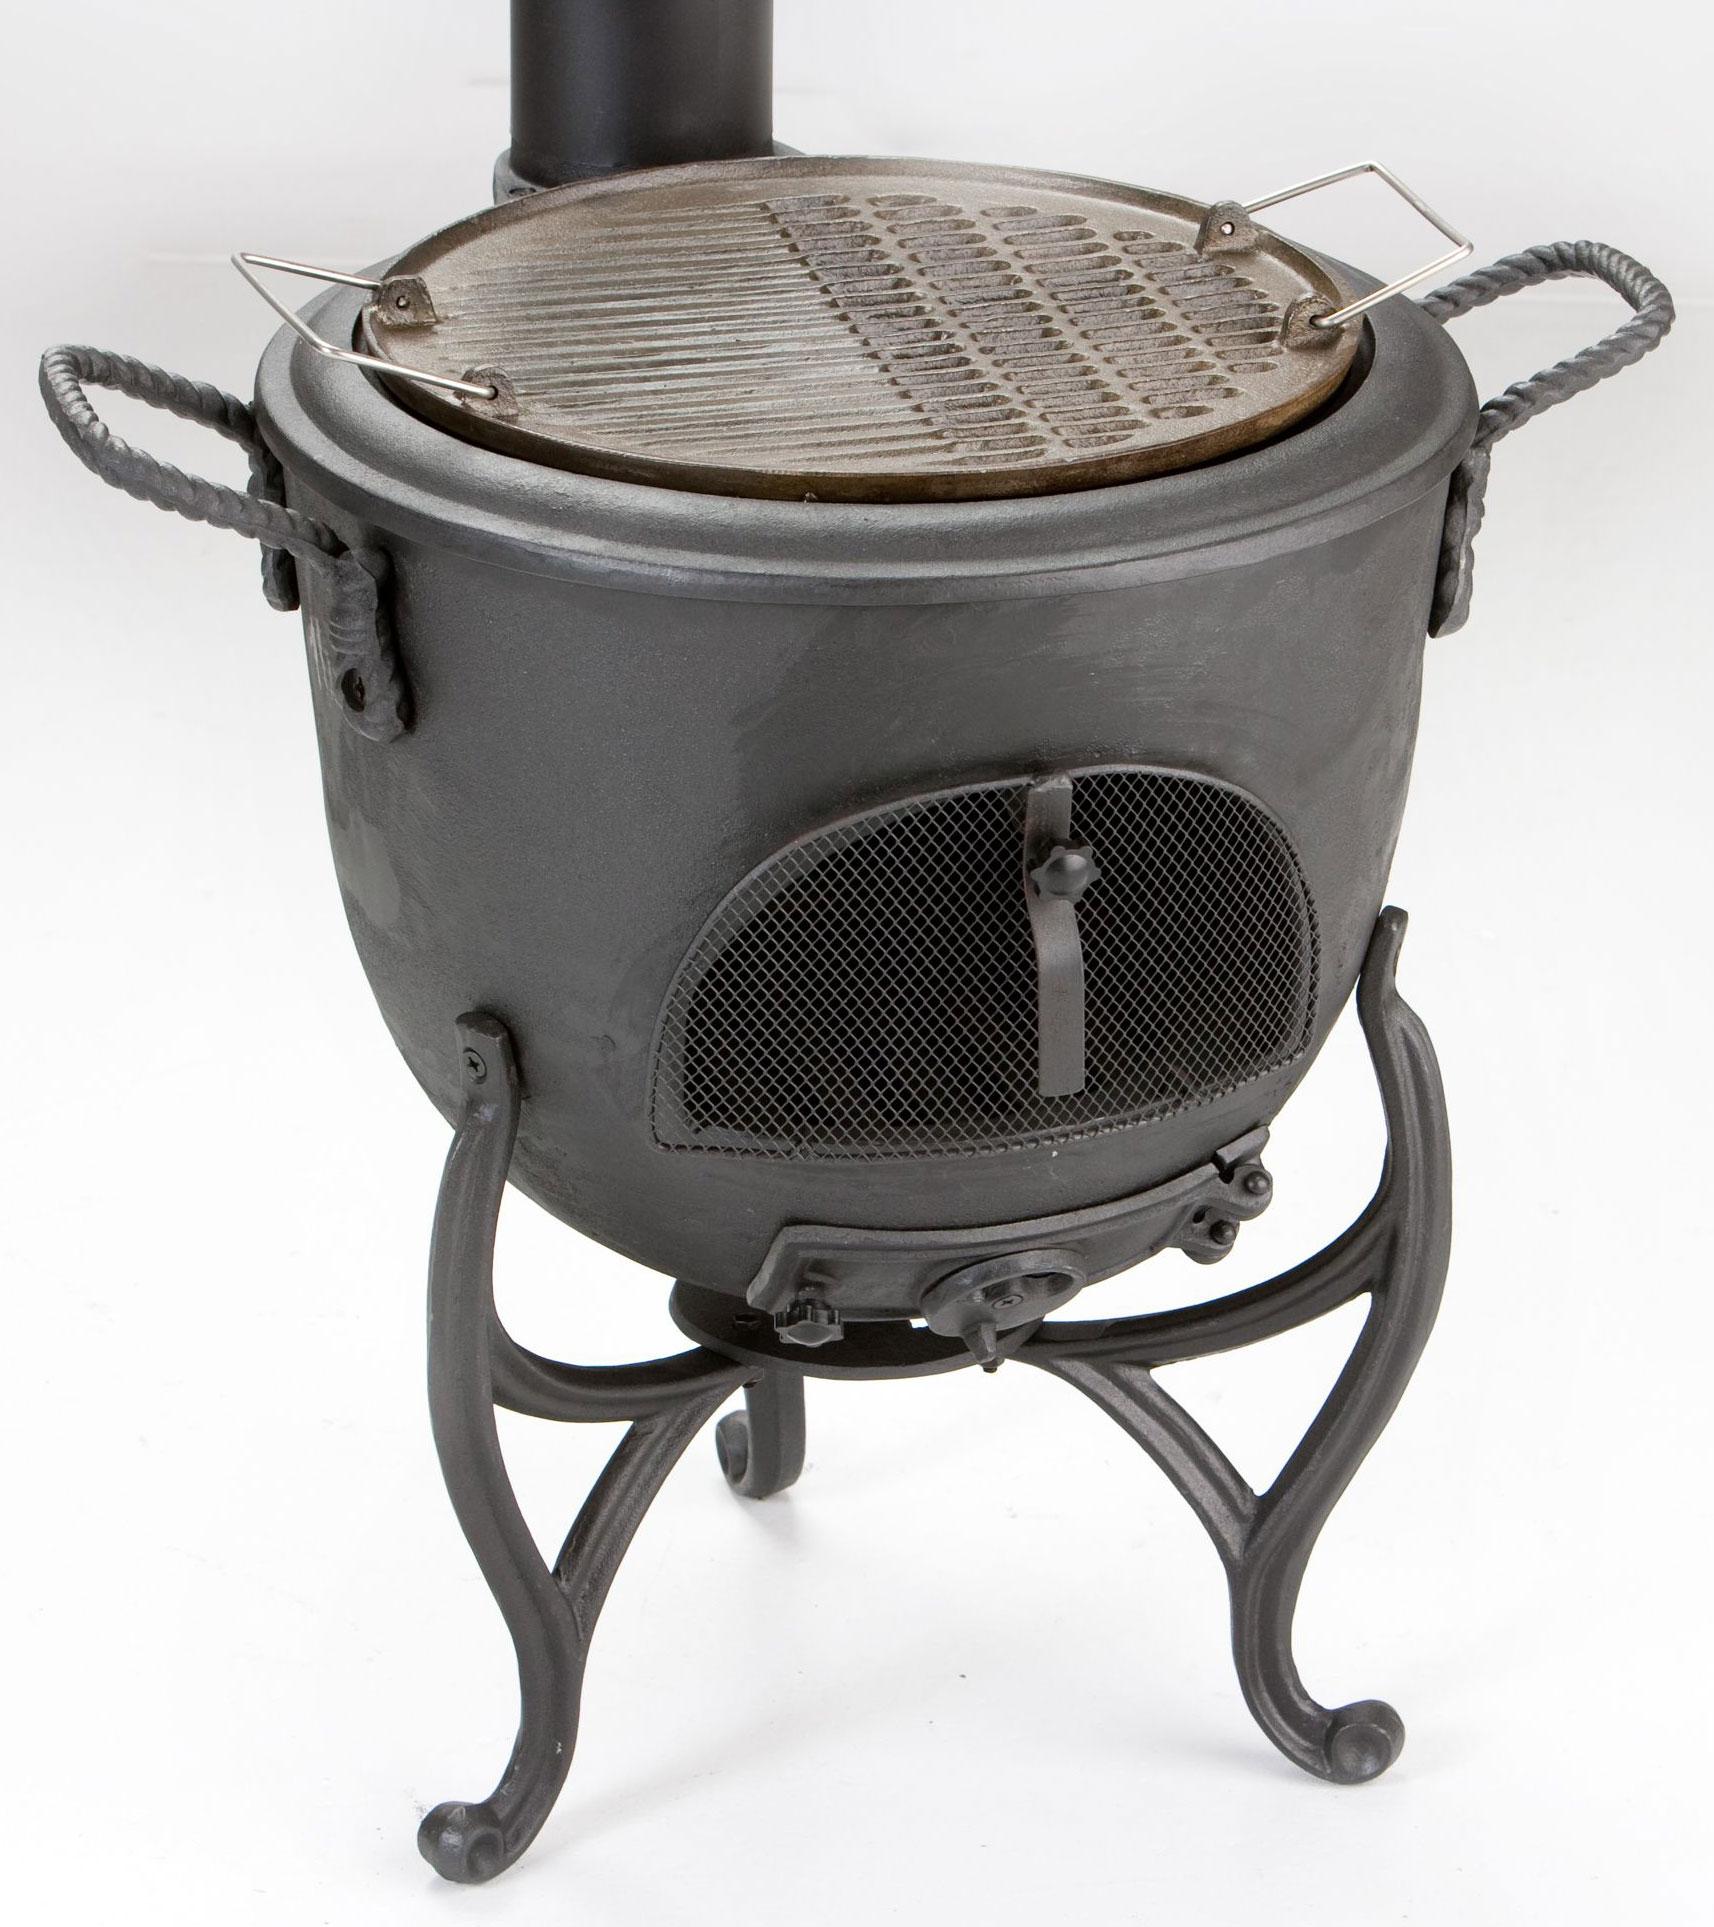 grillplatte globe fire f r vulkan guss 34cm bei. Black Bedroom Furniture Sets. Home Design Ideas